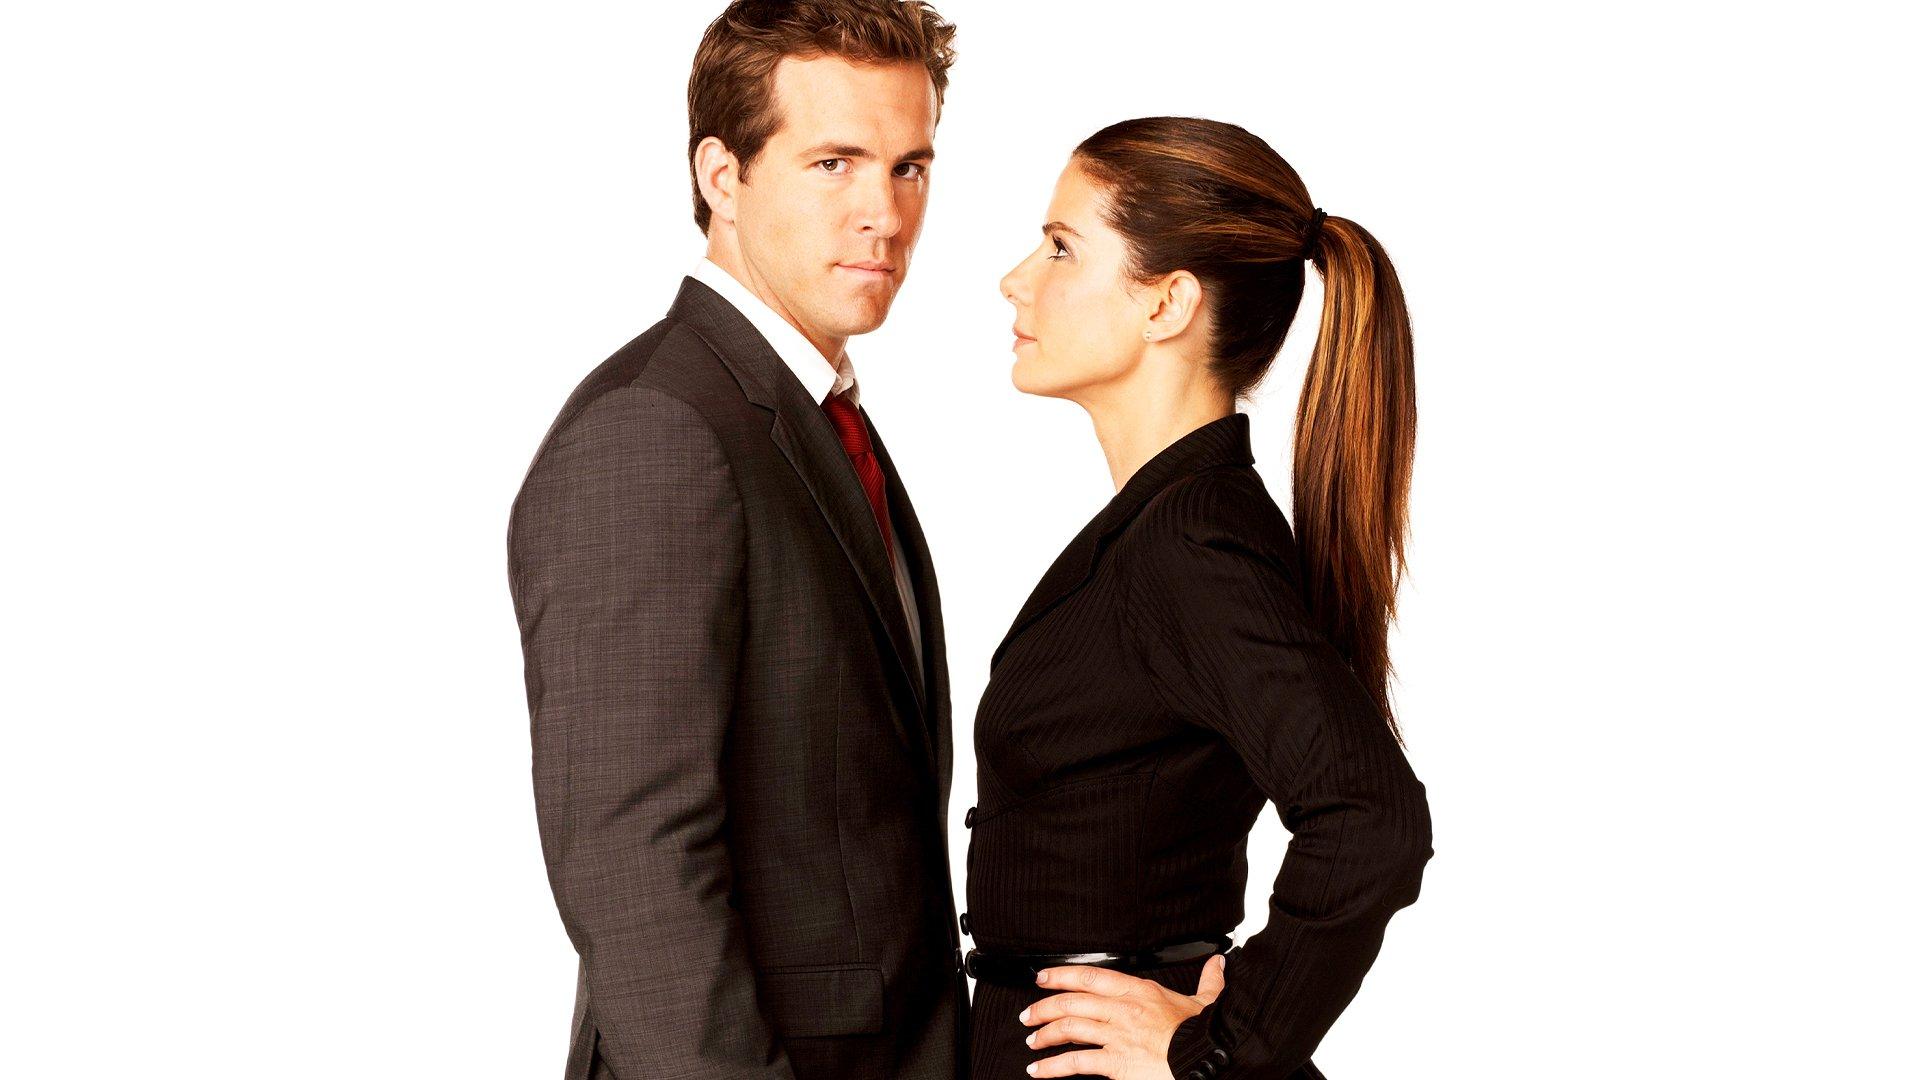 电影 - The Proposal  Ryan Reynolds Sandra Bullock 壁纸